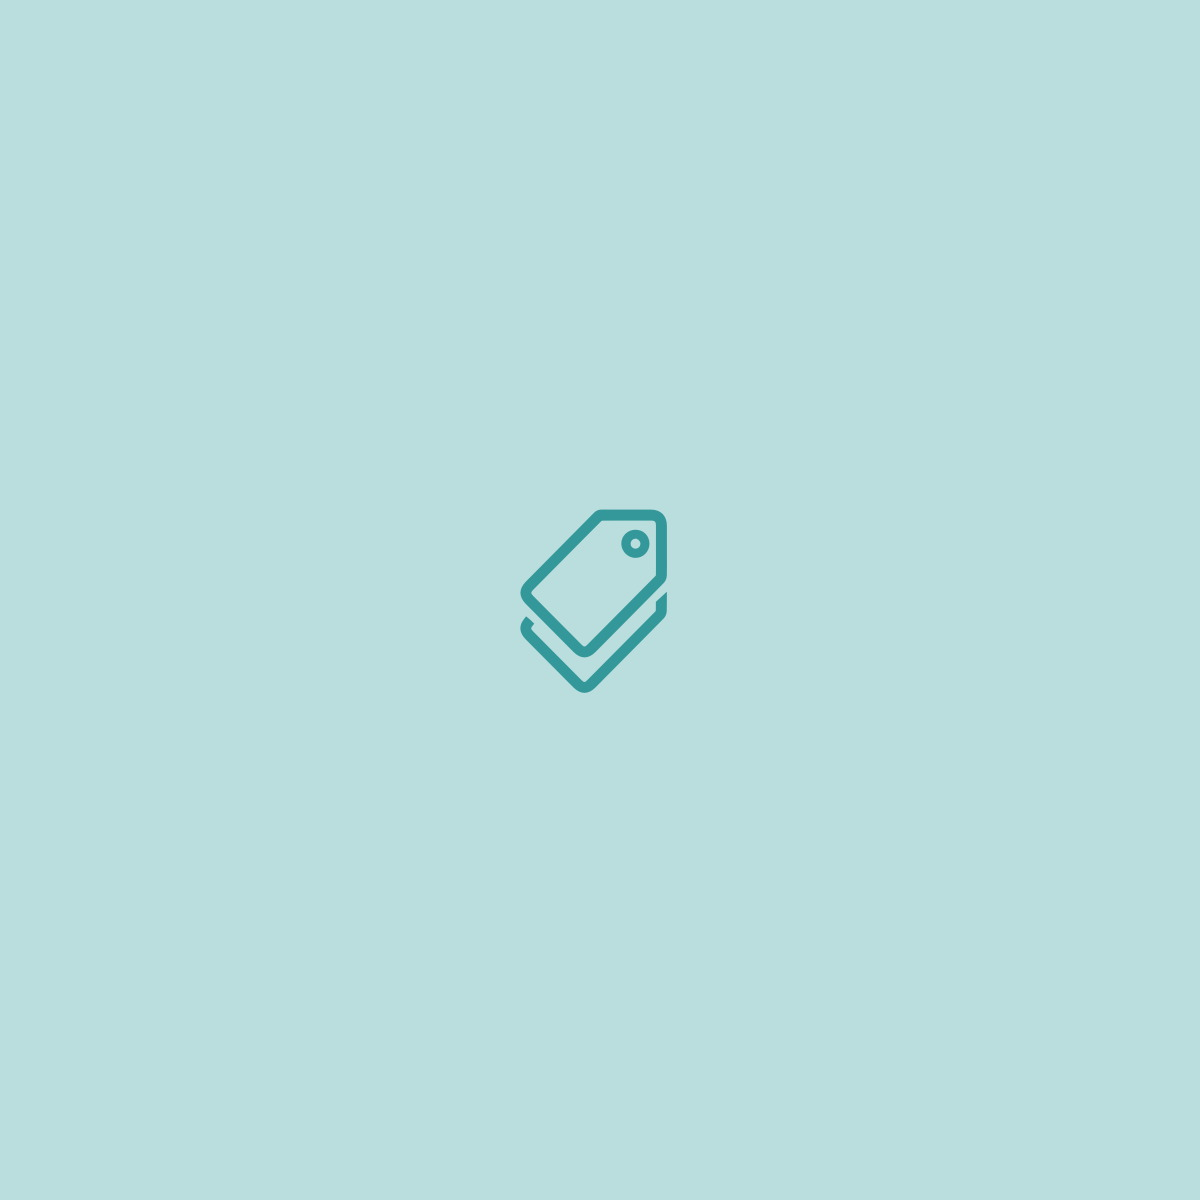 tapete azul marinho e cru marinheiro tapete tapete azul marinho e cru  #2C355F 1200 900